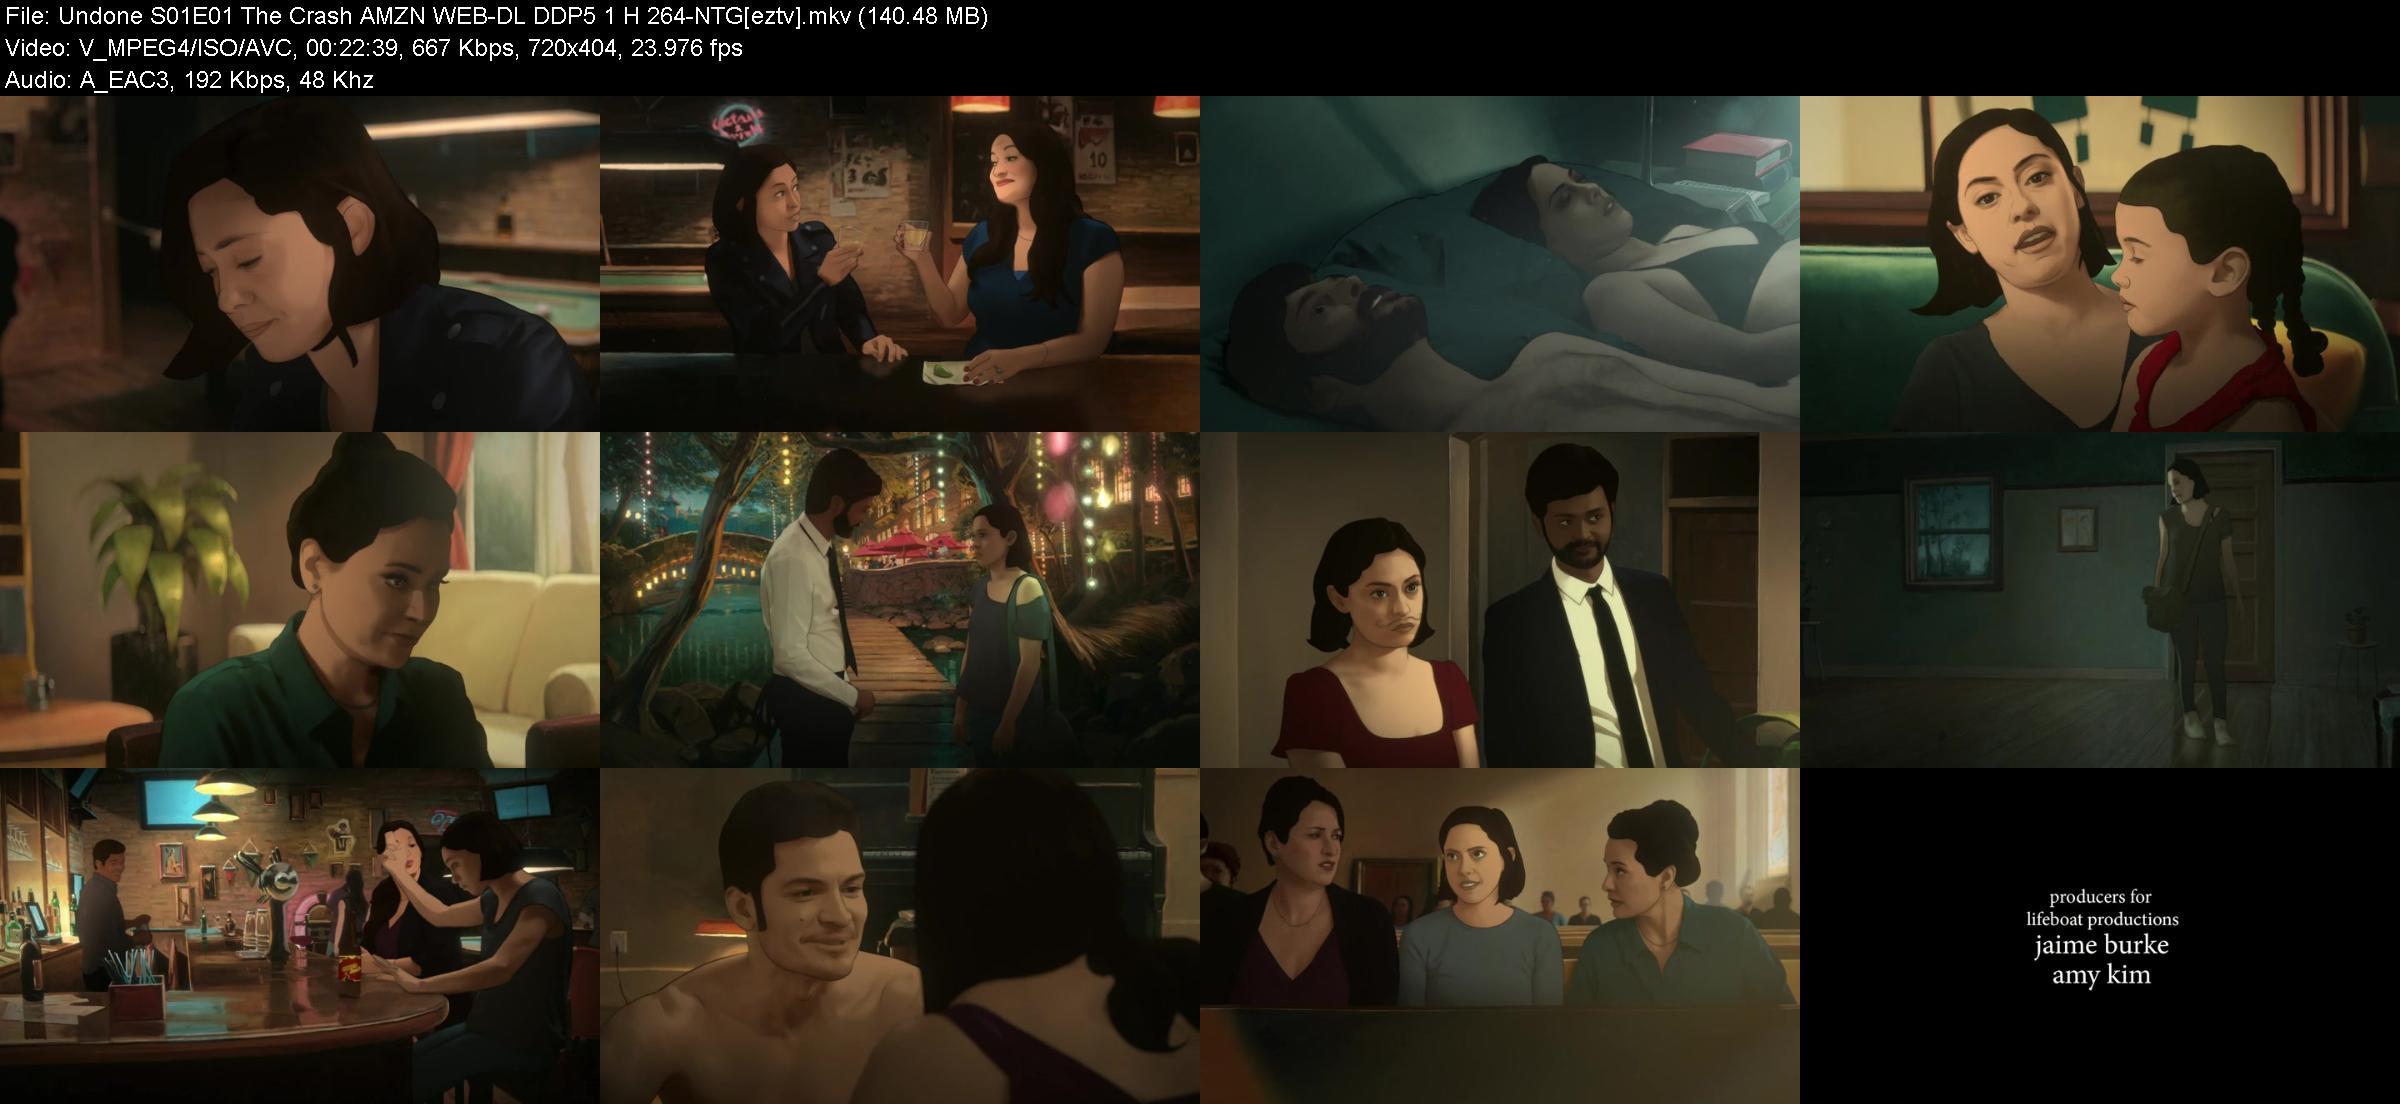 Undone S01E01 The Crash AMZN WEB-DL DDP5 1 H 264-NTG